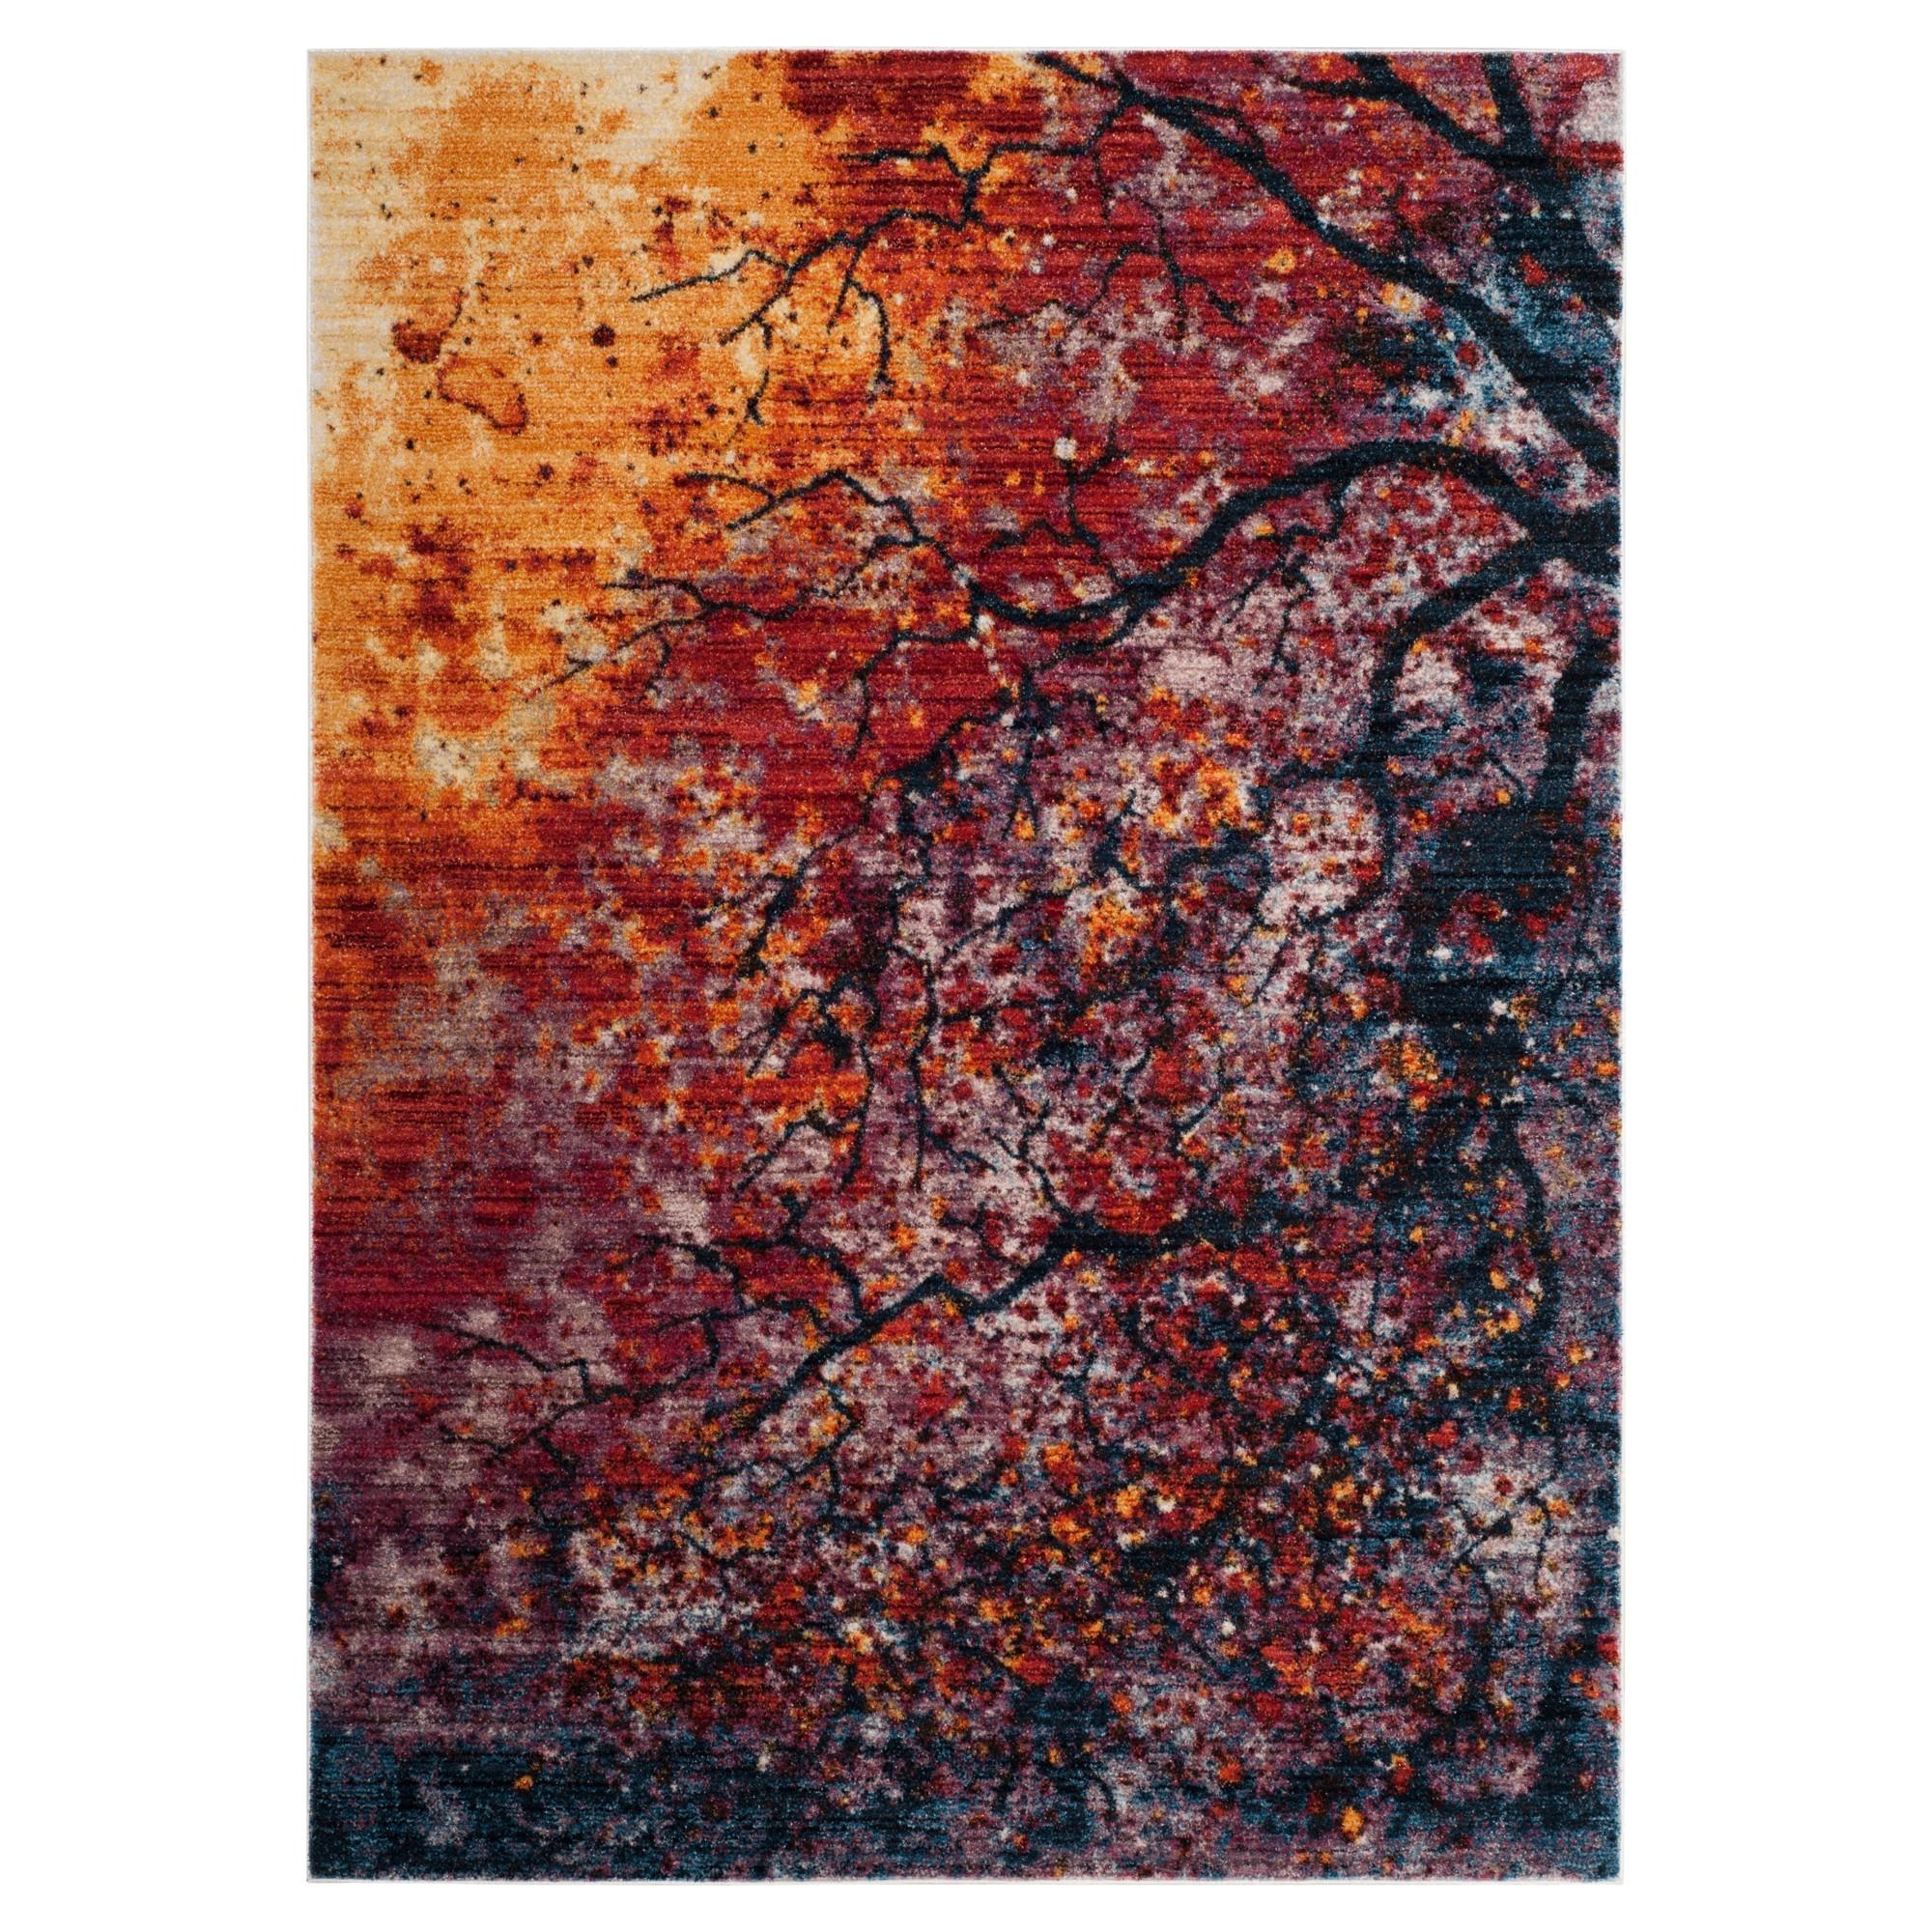 Lavender/Rust Tree Loomed Accent Rug 3'X5' - Safavieh, Red Purple